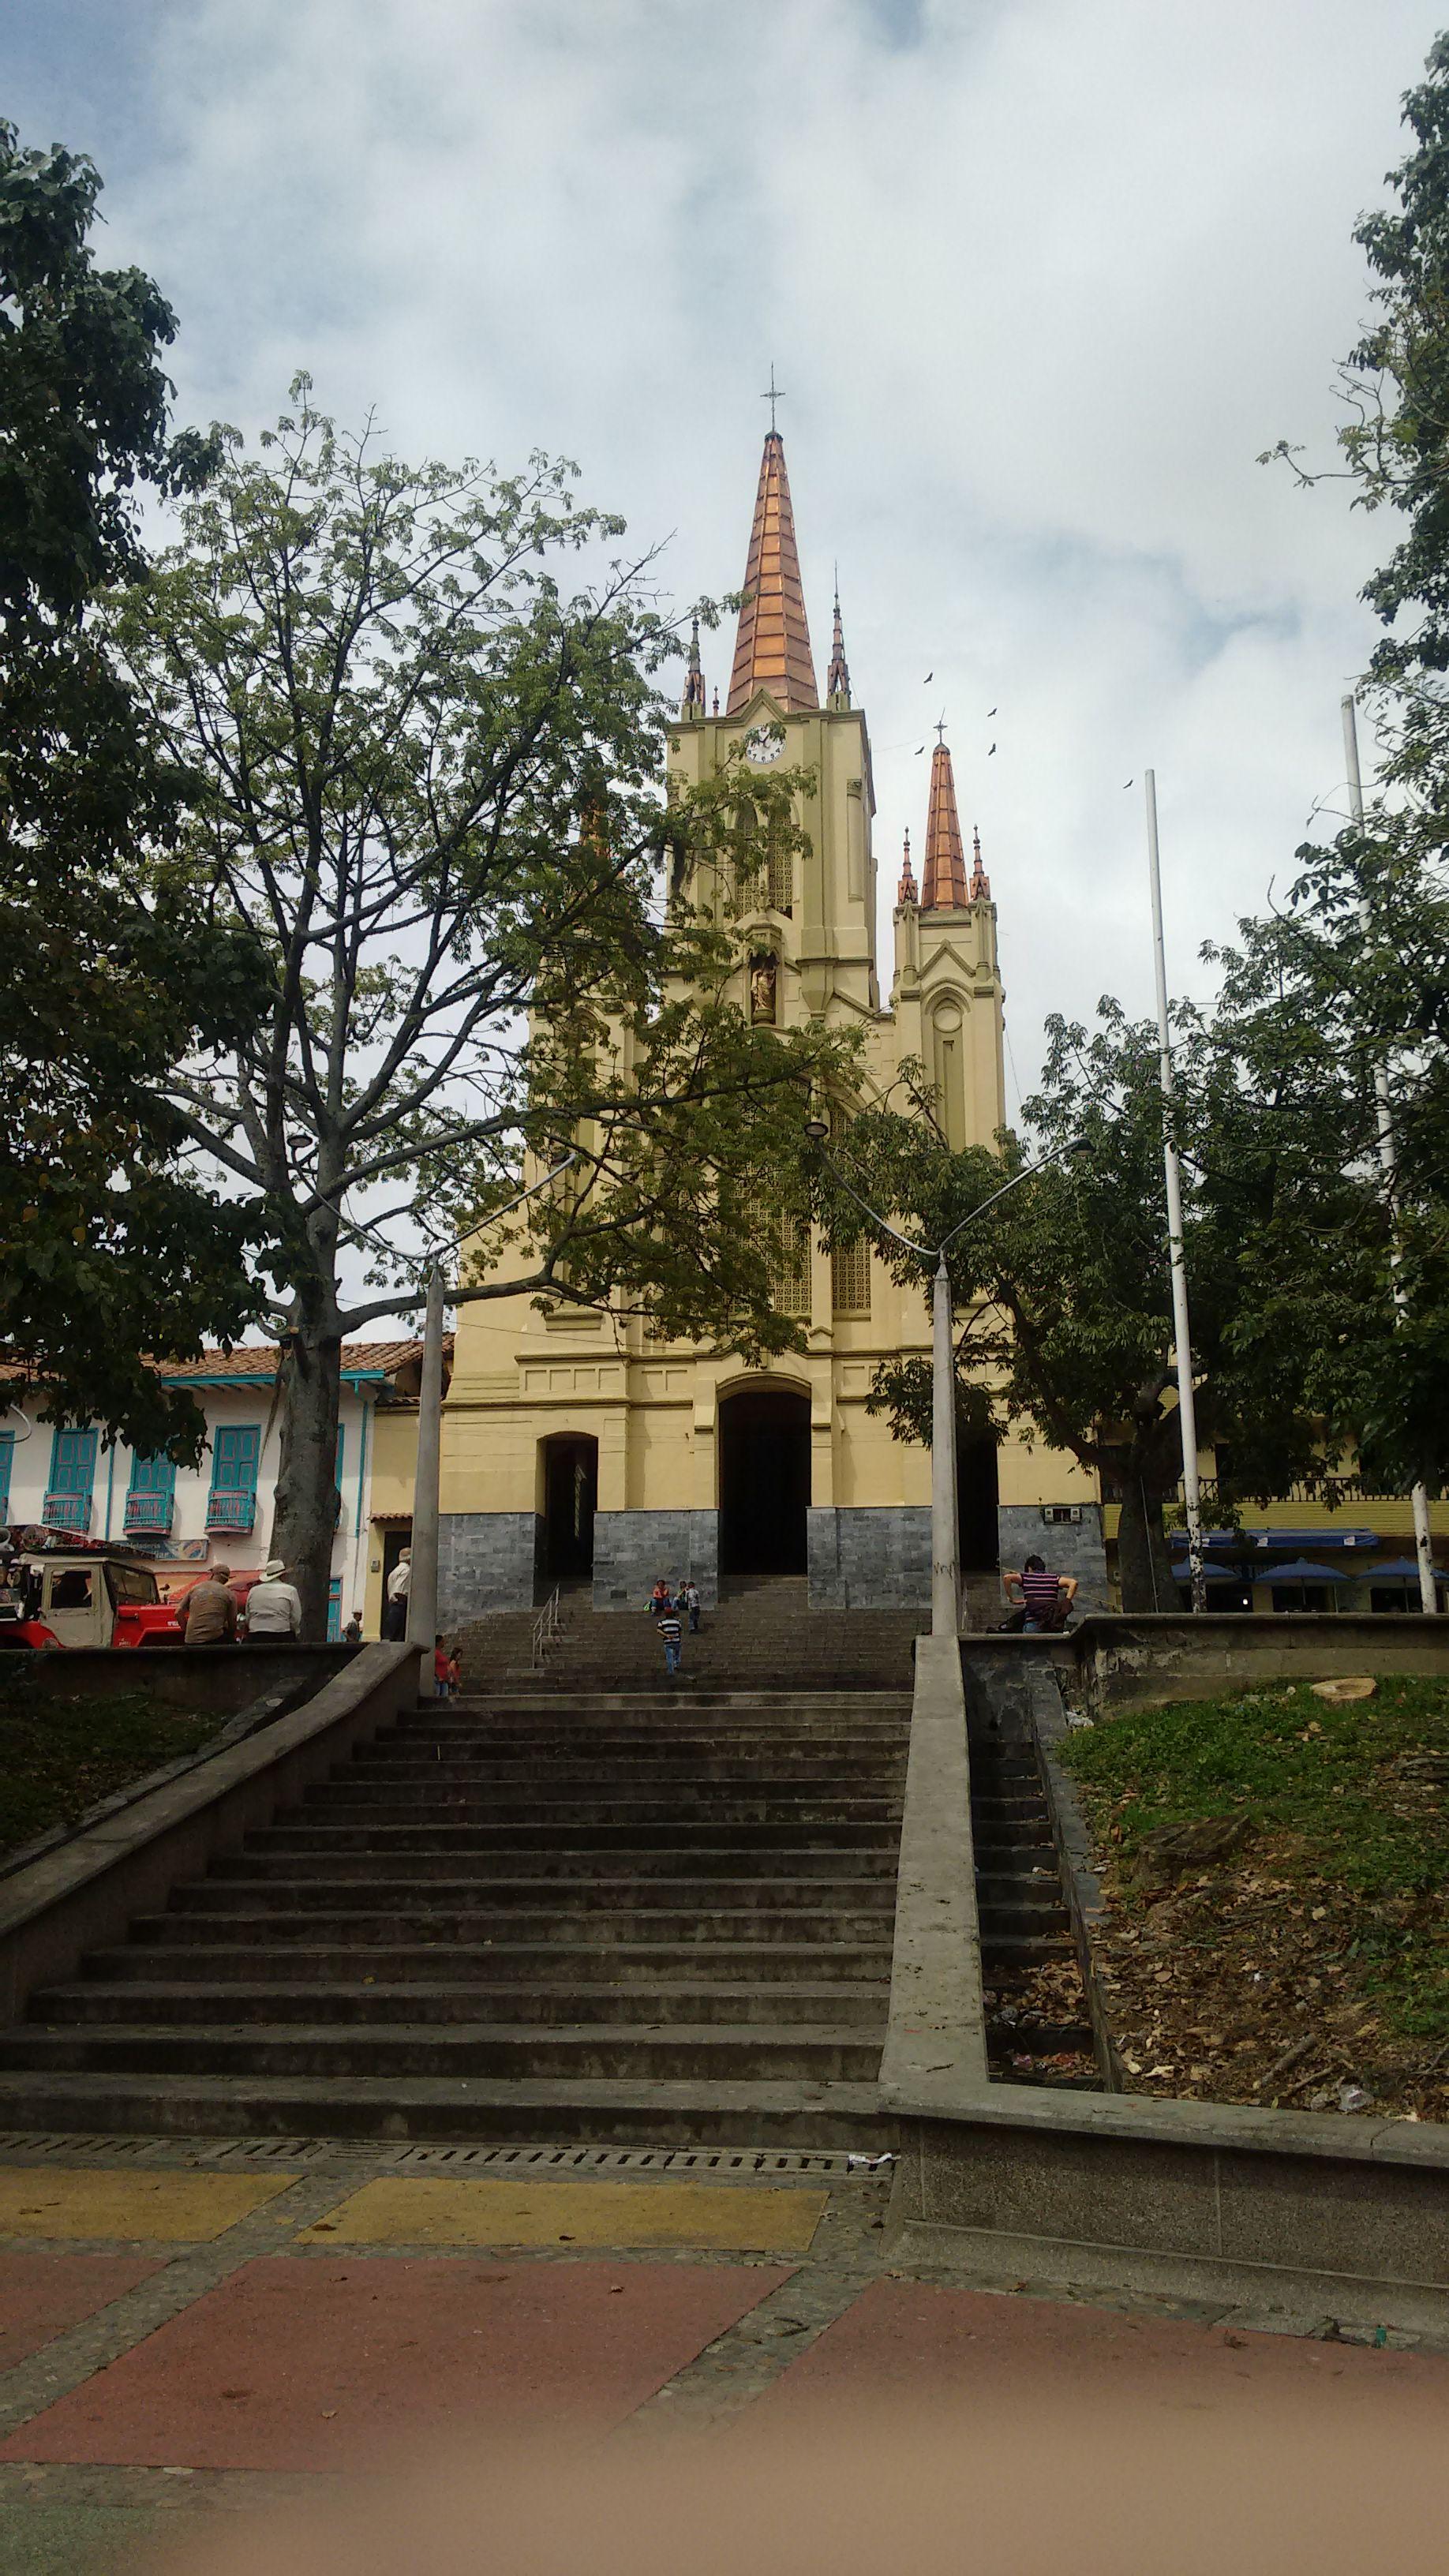 Dateiiglesia San Fernando Rey Vista Fachadajpg Wikipedia